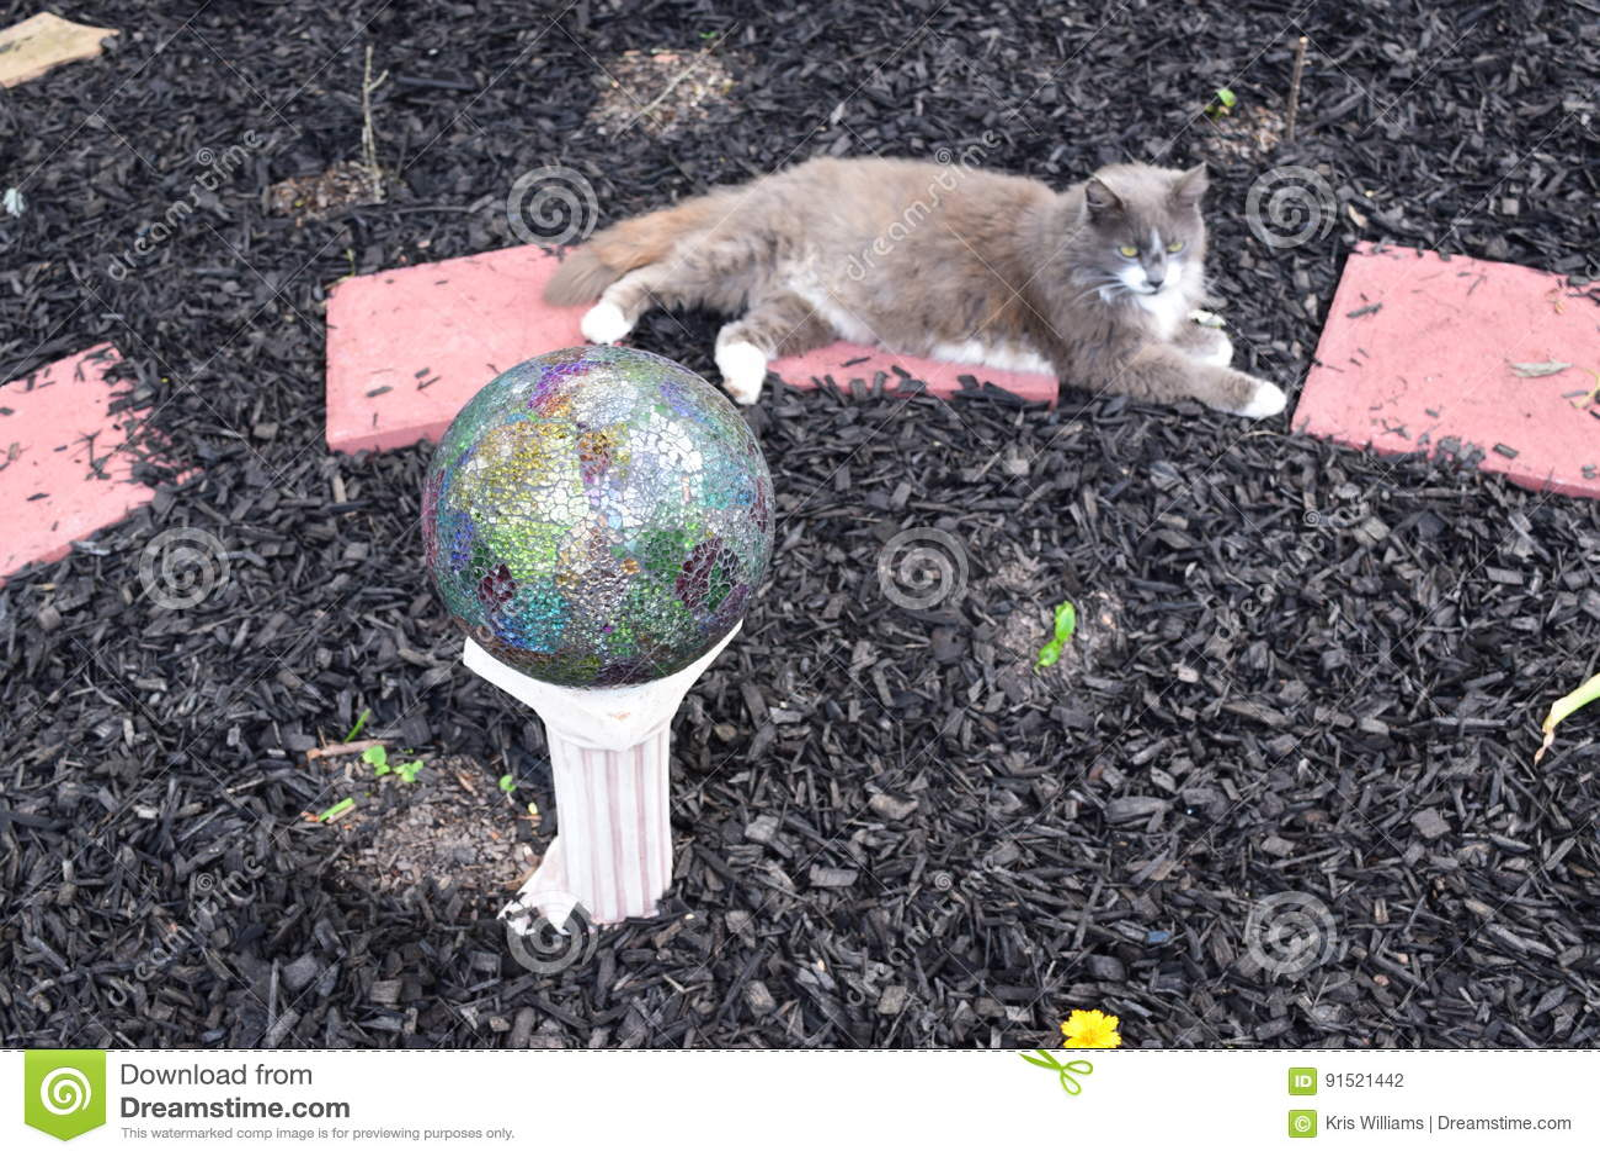 Cat and gazing ball